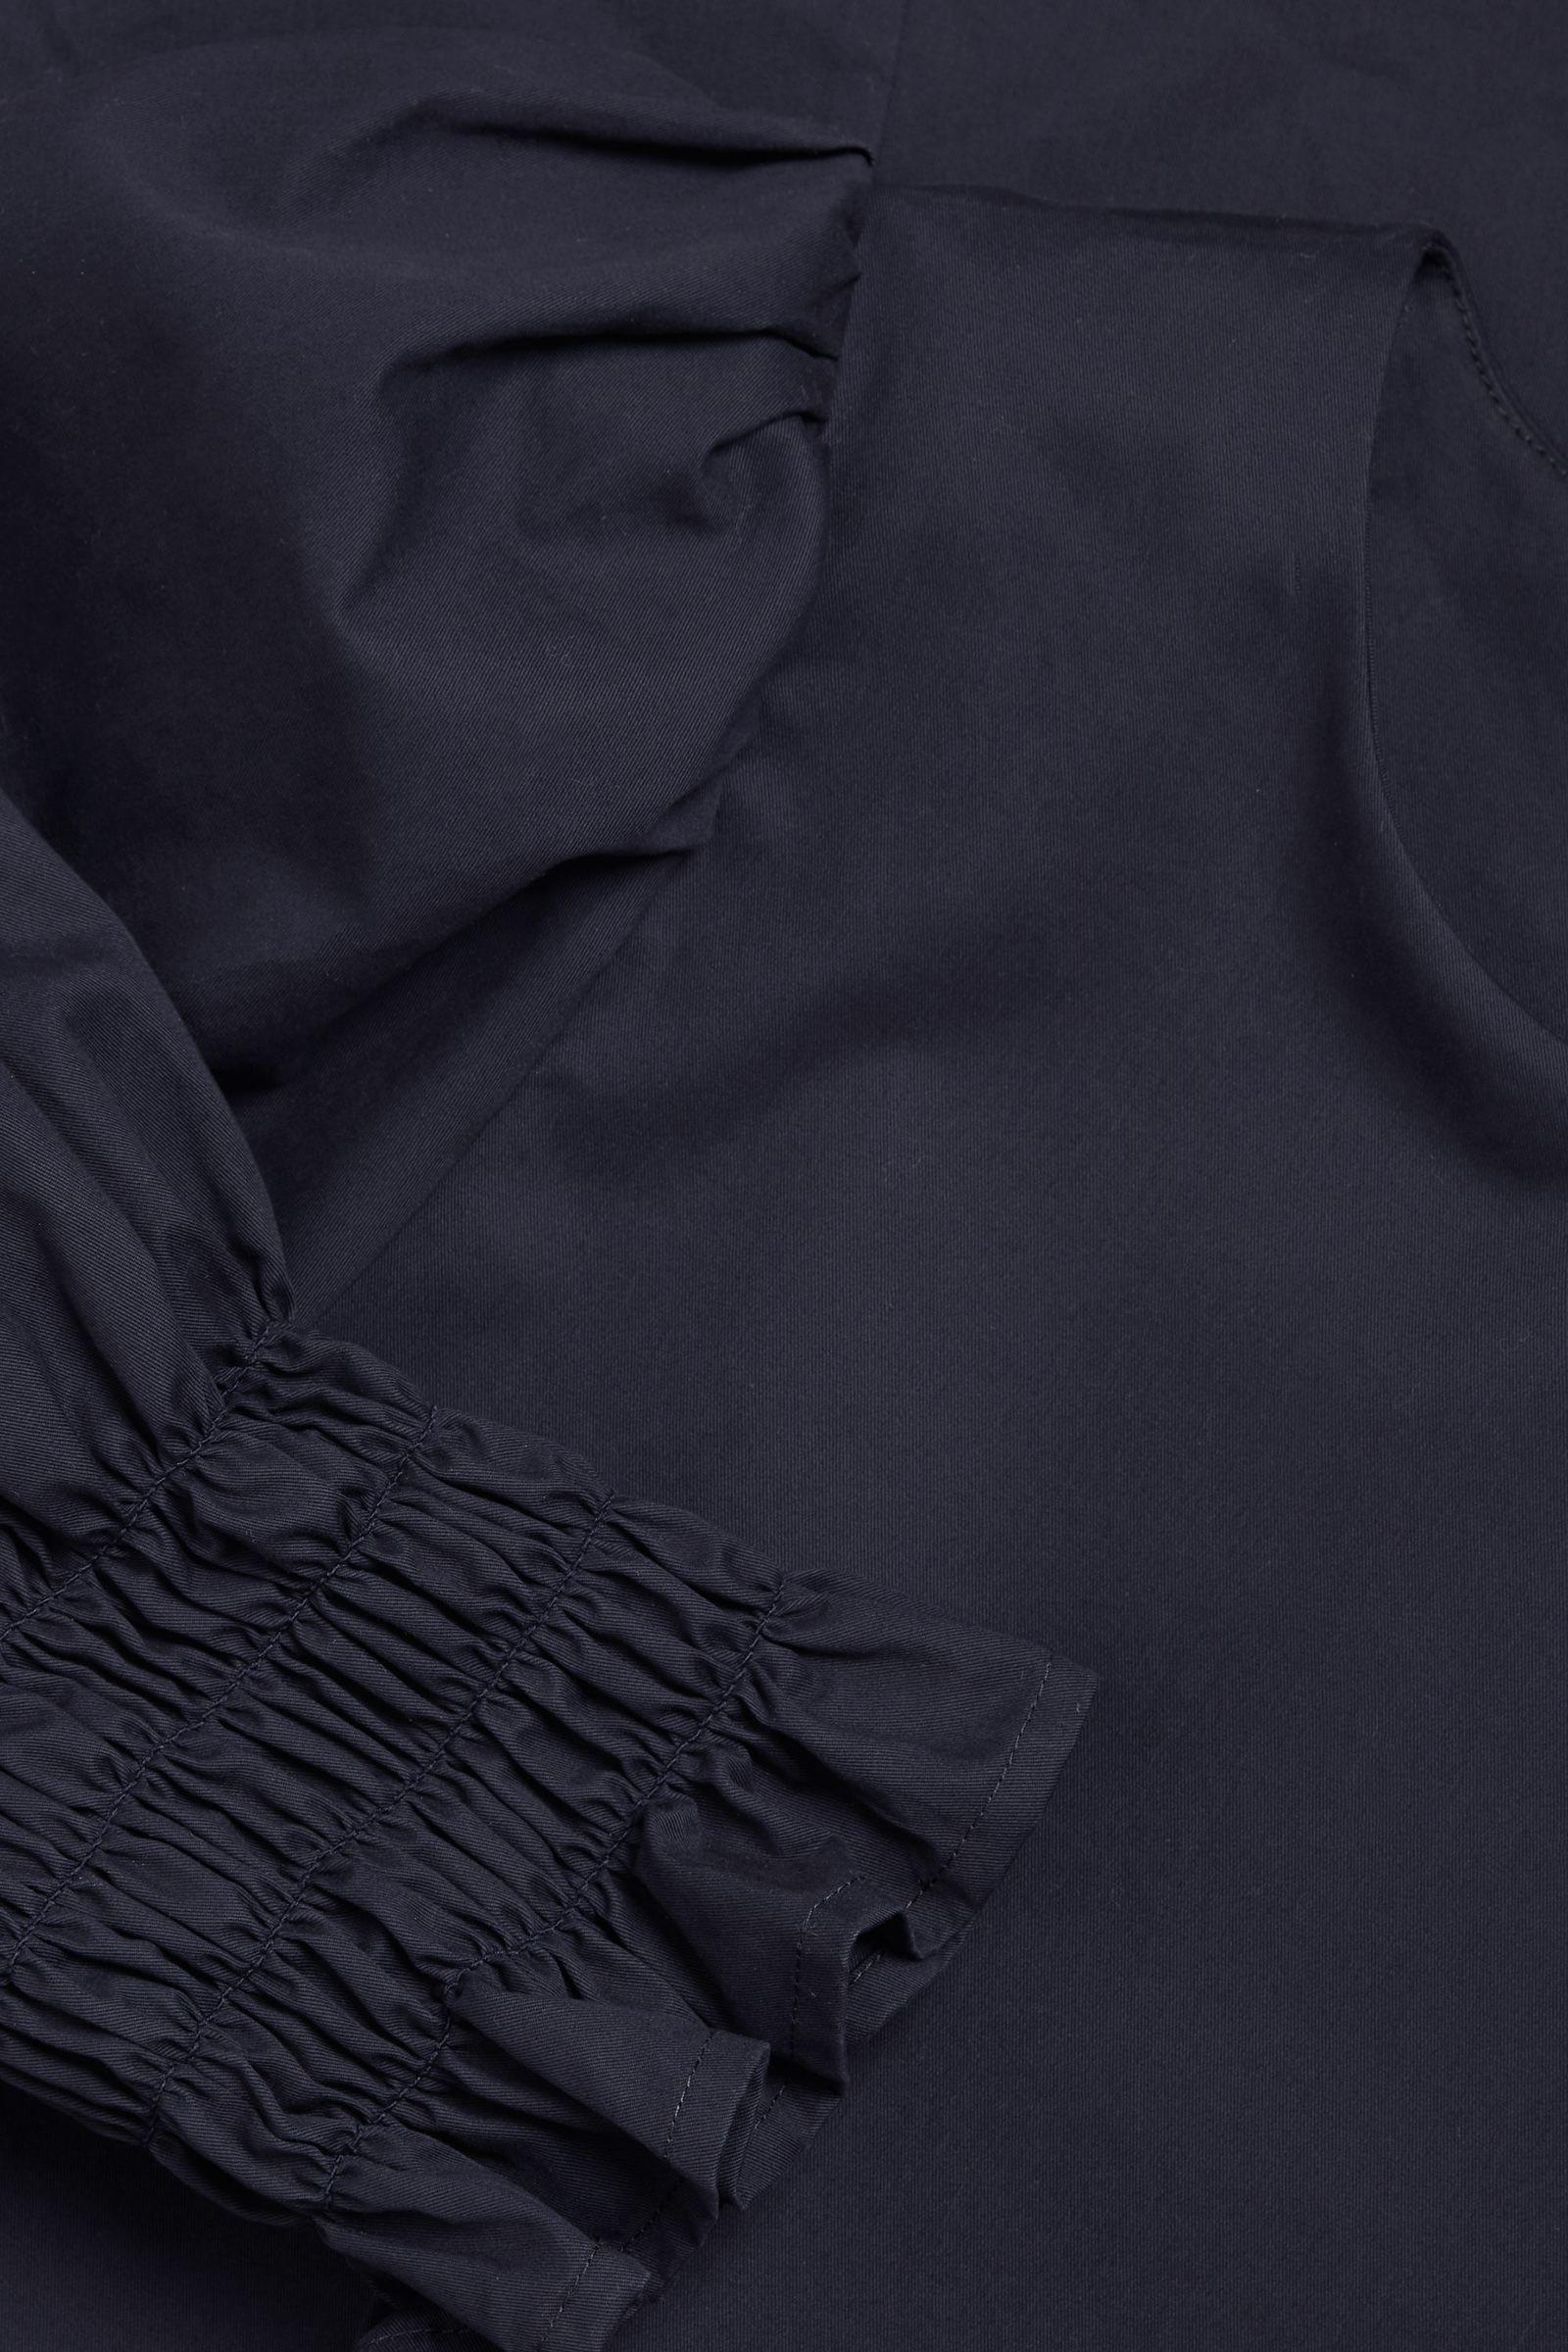 COS 코튼 스모킹 퍼프 슬리브 드레스의 다크 블루컬러 Detail입니다.